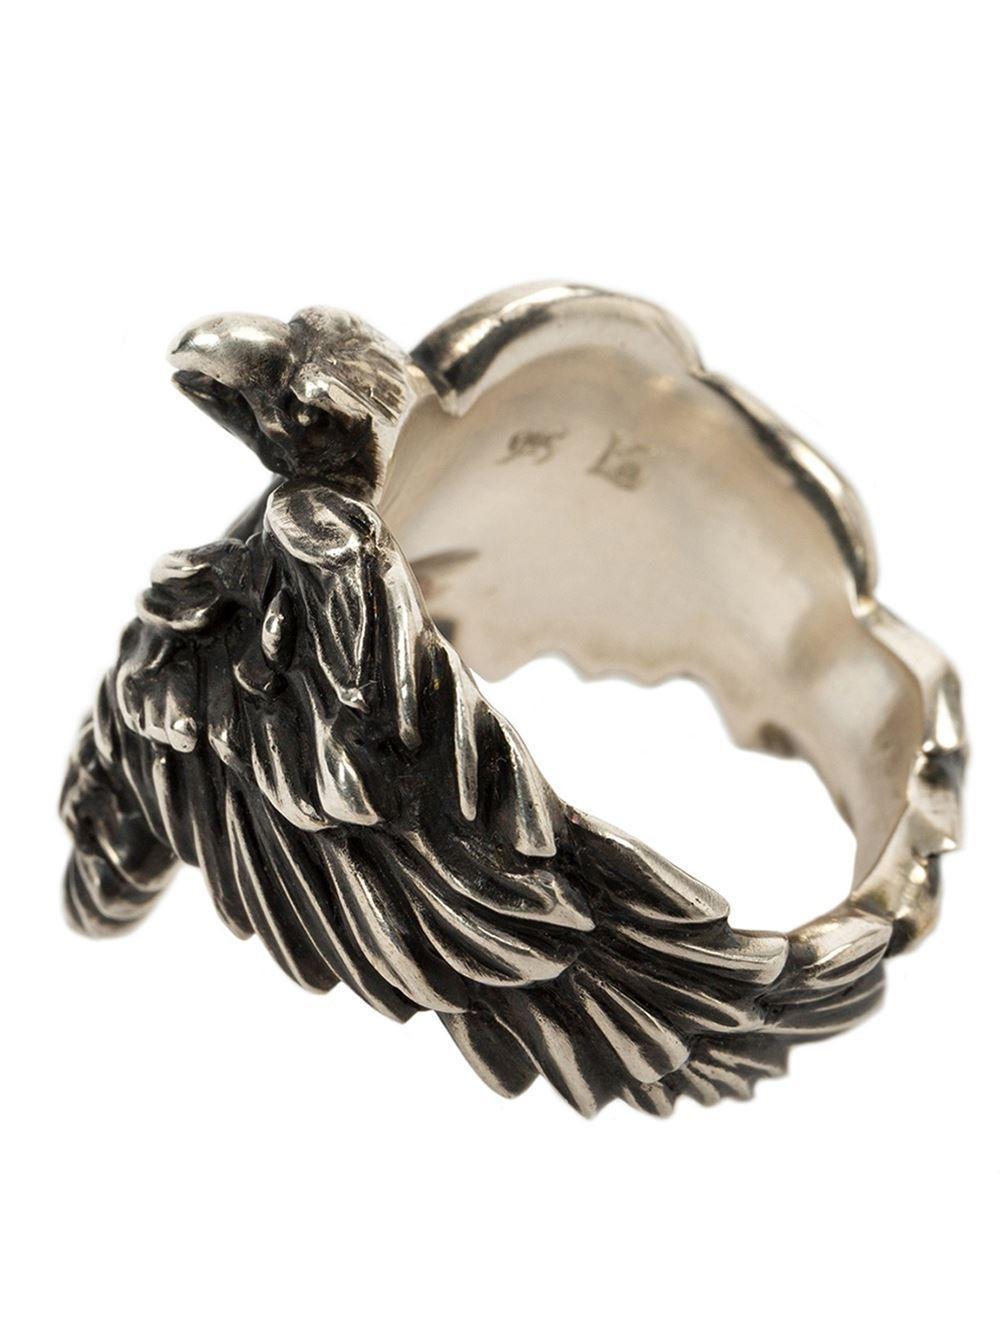 werkstatt m nchen eagle ring in metallic for men lyst. Black Bedroom Furniture Sets. Home Design Ideas